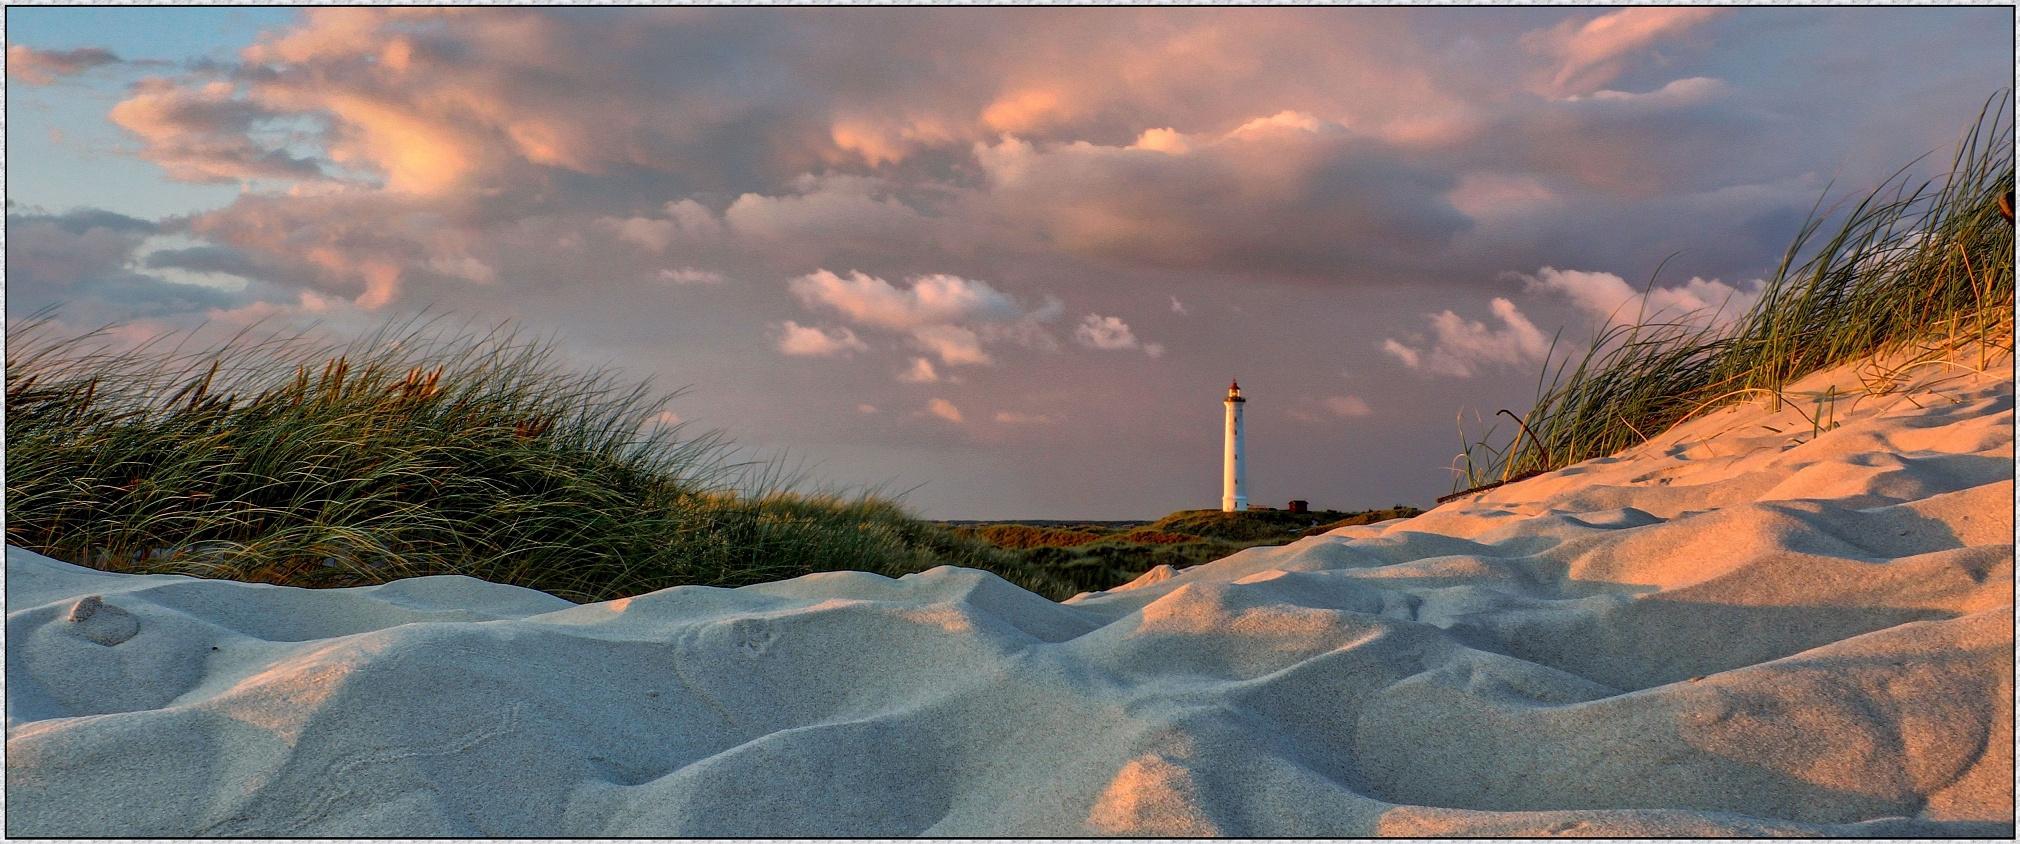 Lyngvig Fyr; Leuchtturm  südlich von Søndervig  (Dänemark 2017)